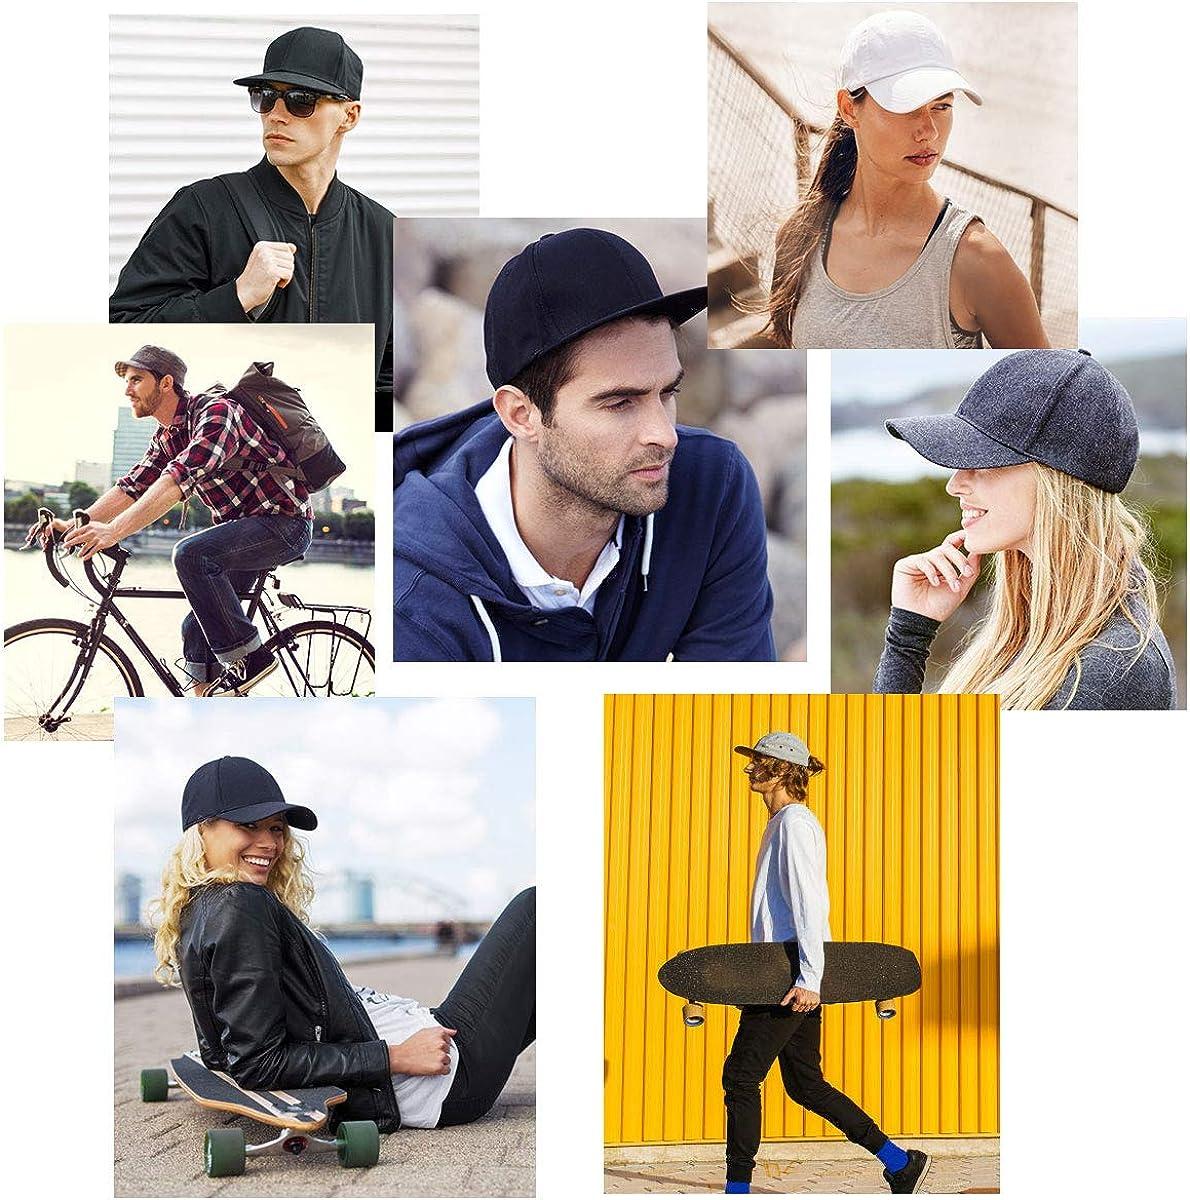 Sun Messy High Bun Cap Adjustable Pony Caps Mesh Cap Classic Plain Hat Black+White Ponytail Baseball Cap Sports Casual Trucker Hats Cap for Mens Women